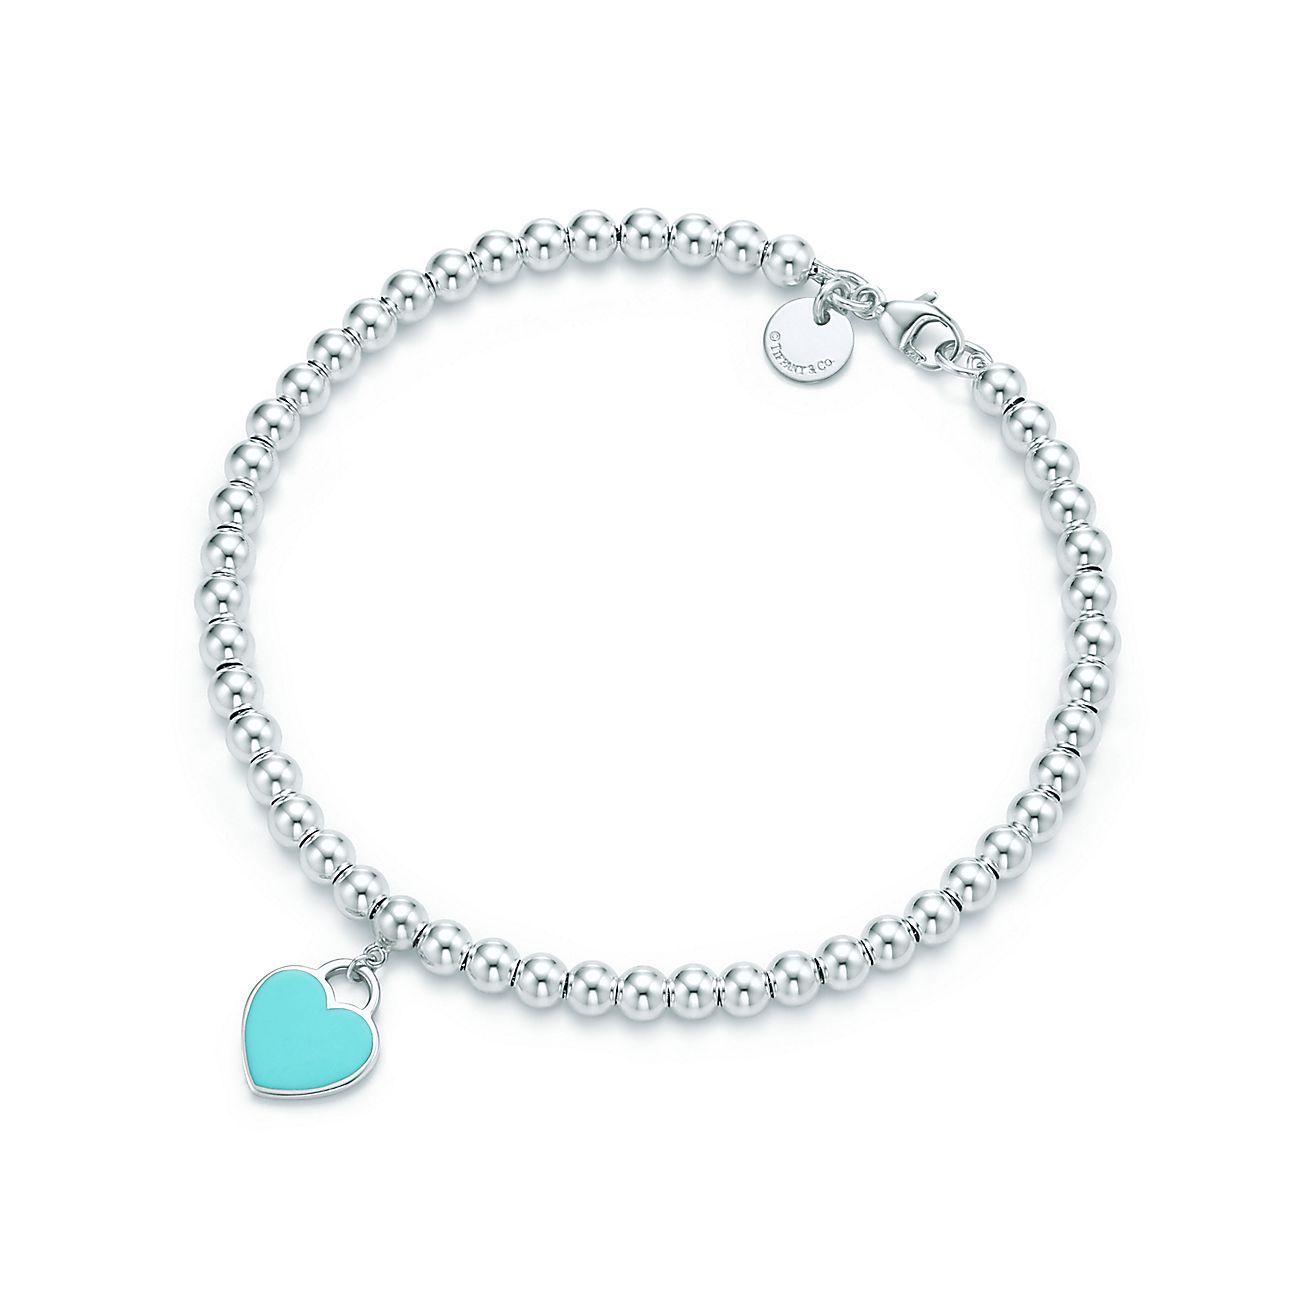 Tiffany Heart Bracelet >> Return To Tiffany Mini Heart Tag Bead Bracelet Tiffany Co